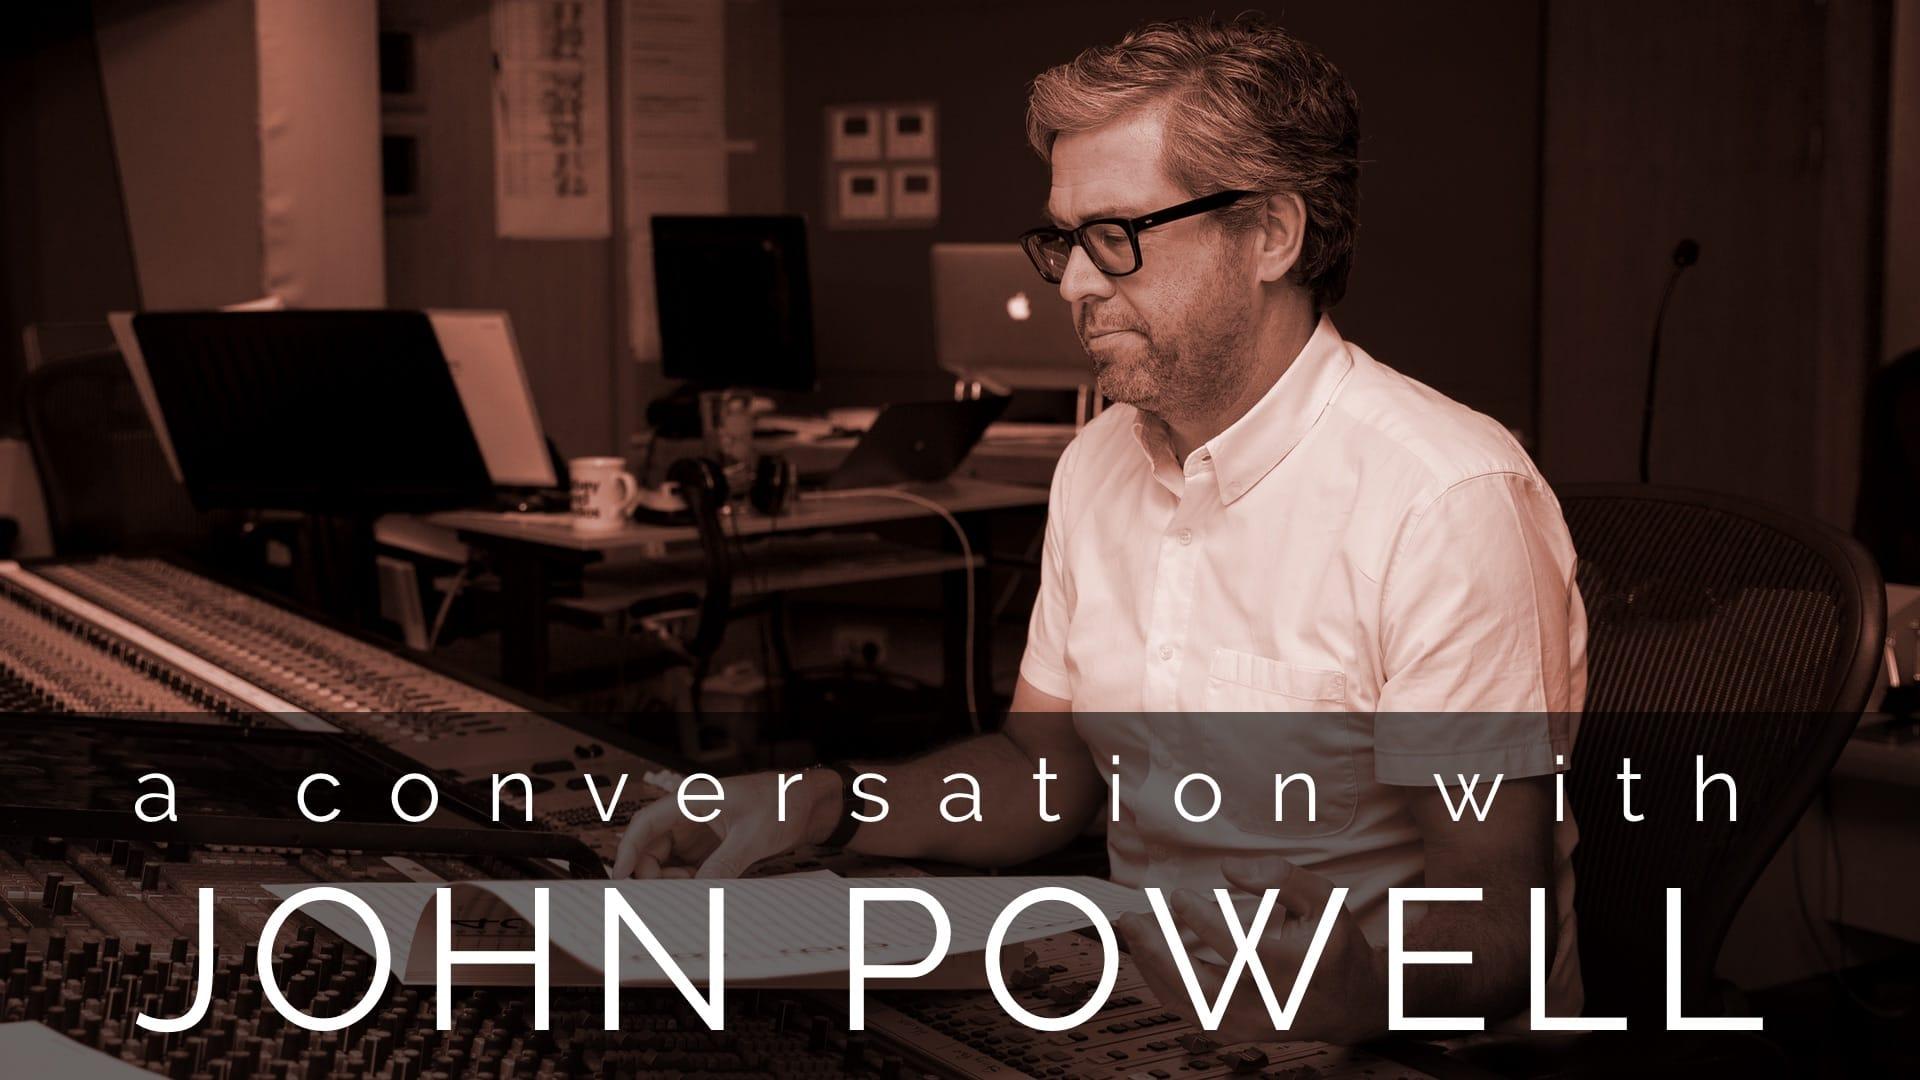 John Powell FOFM 3